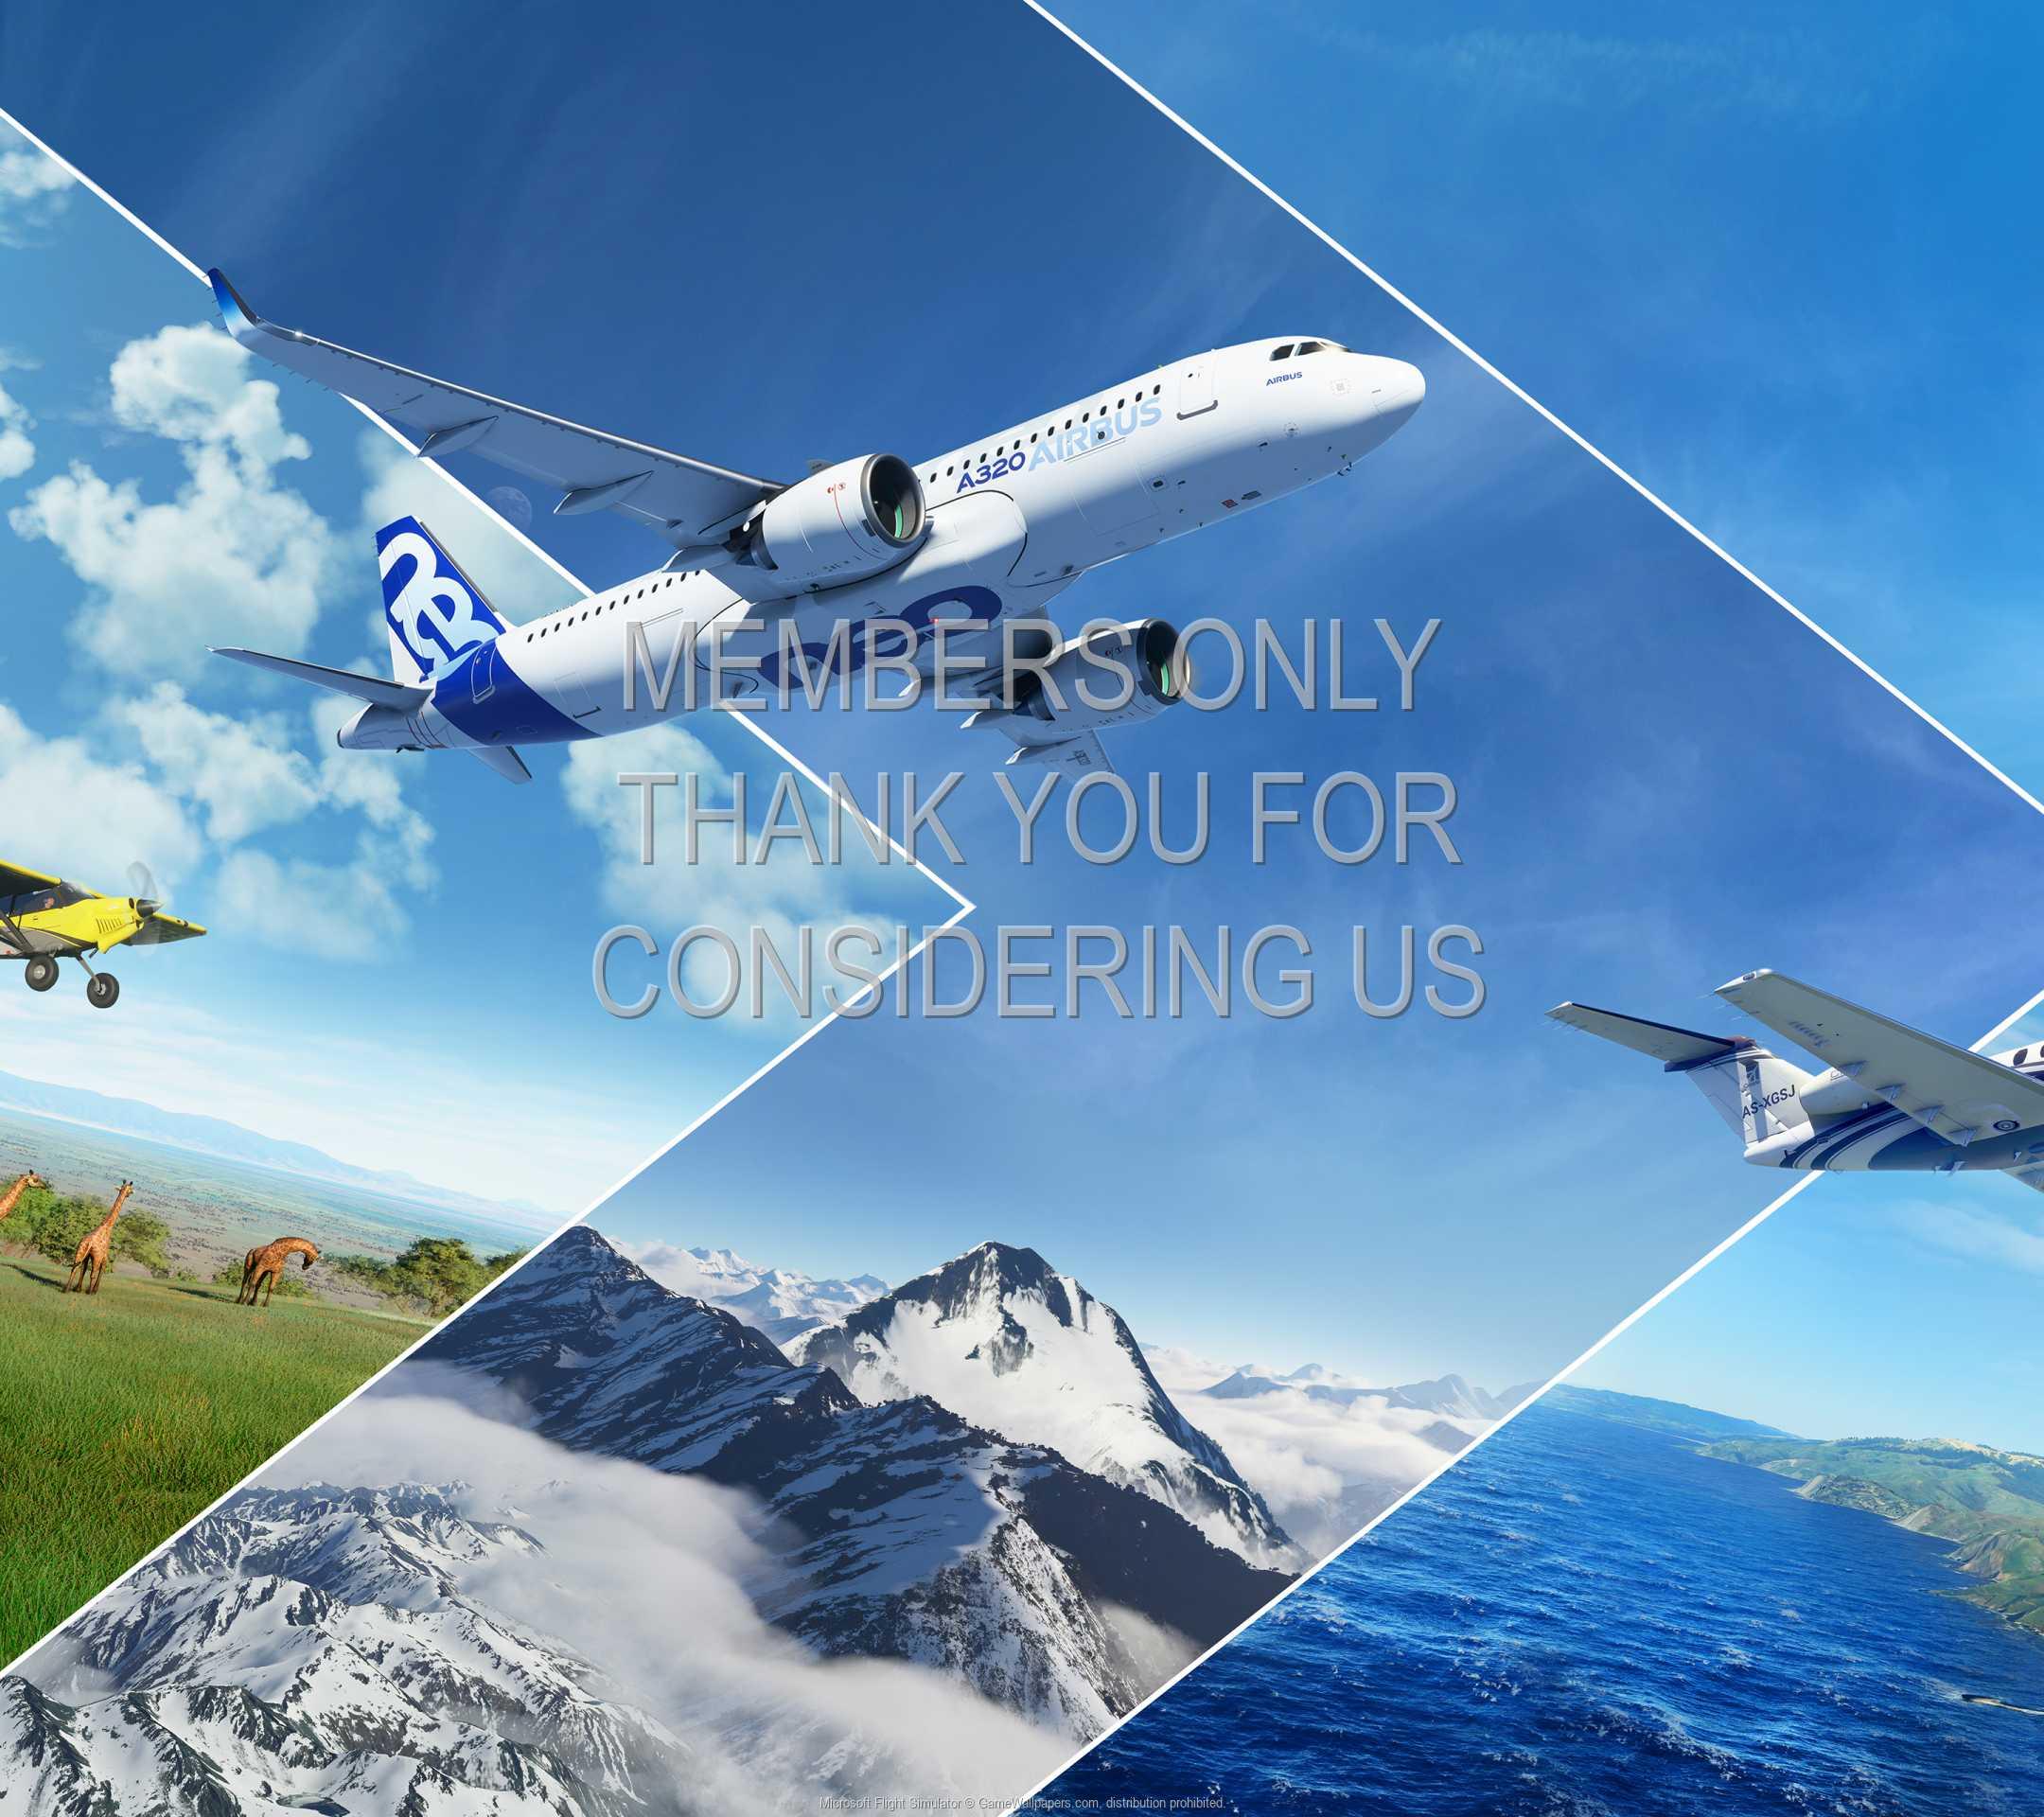 Microsoft Flight Simulator 1080p Horizontal Mobile wallpaper or background 01